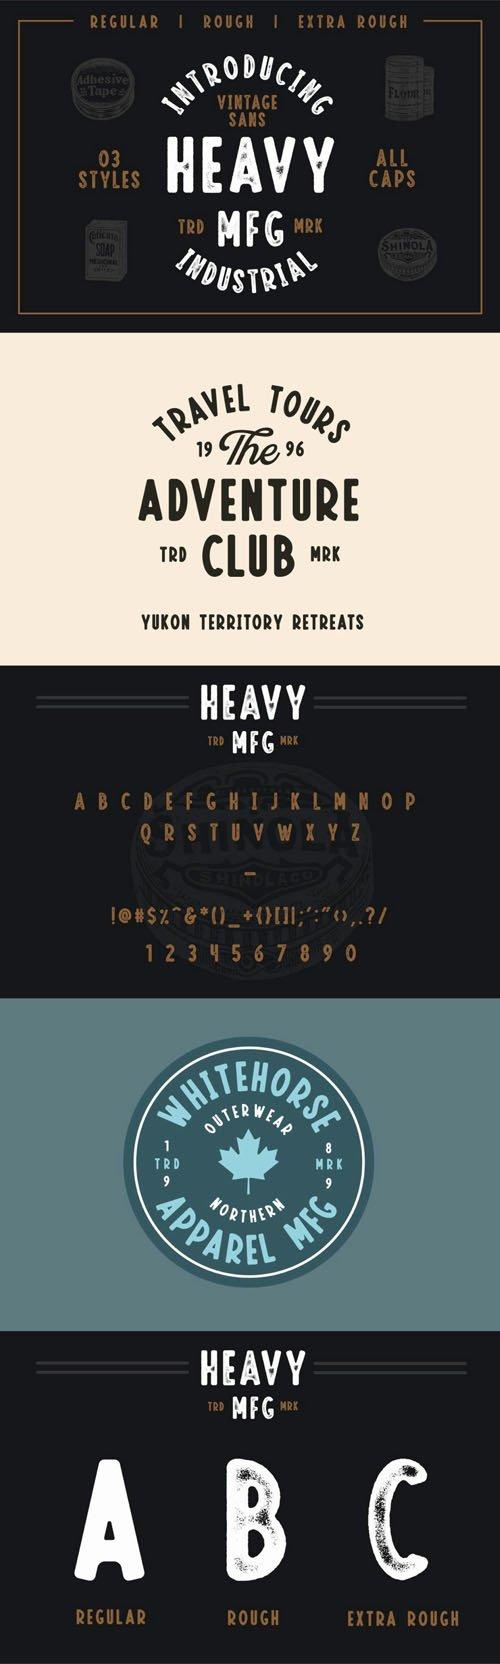 Heavy MFG - Vintage Press Inspired Sans Serif Font